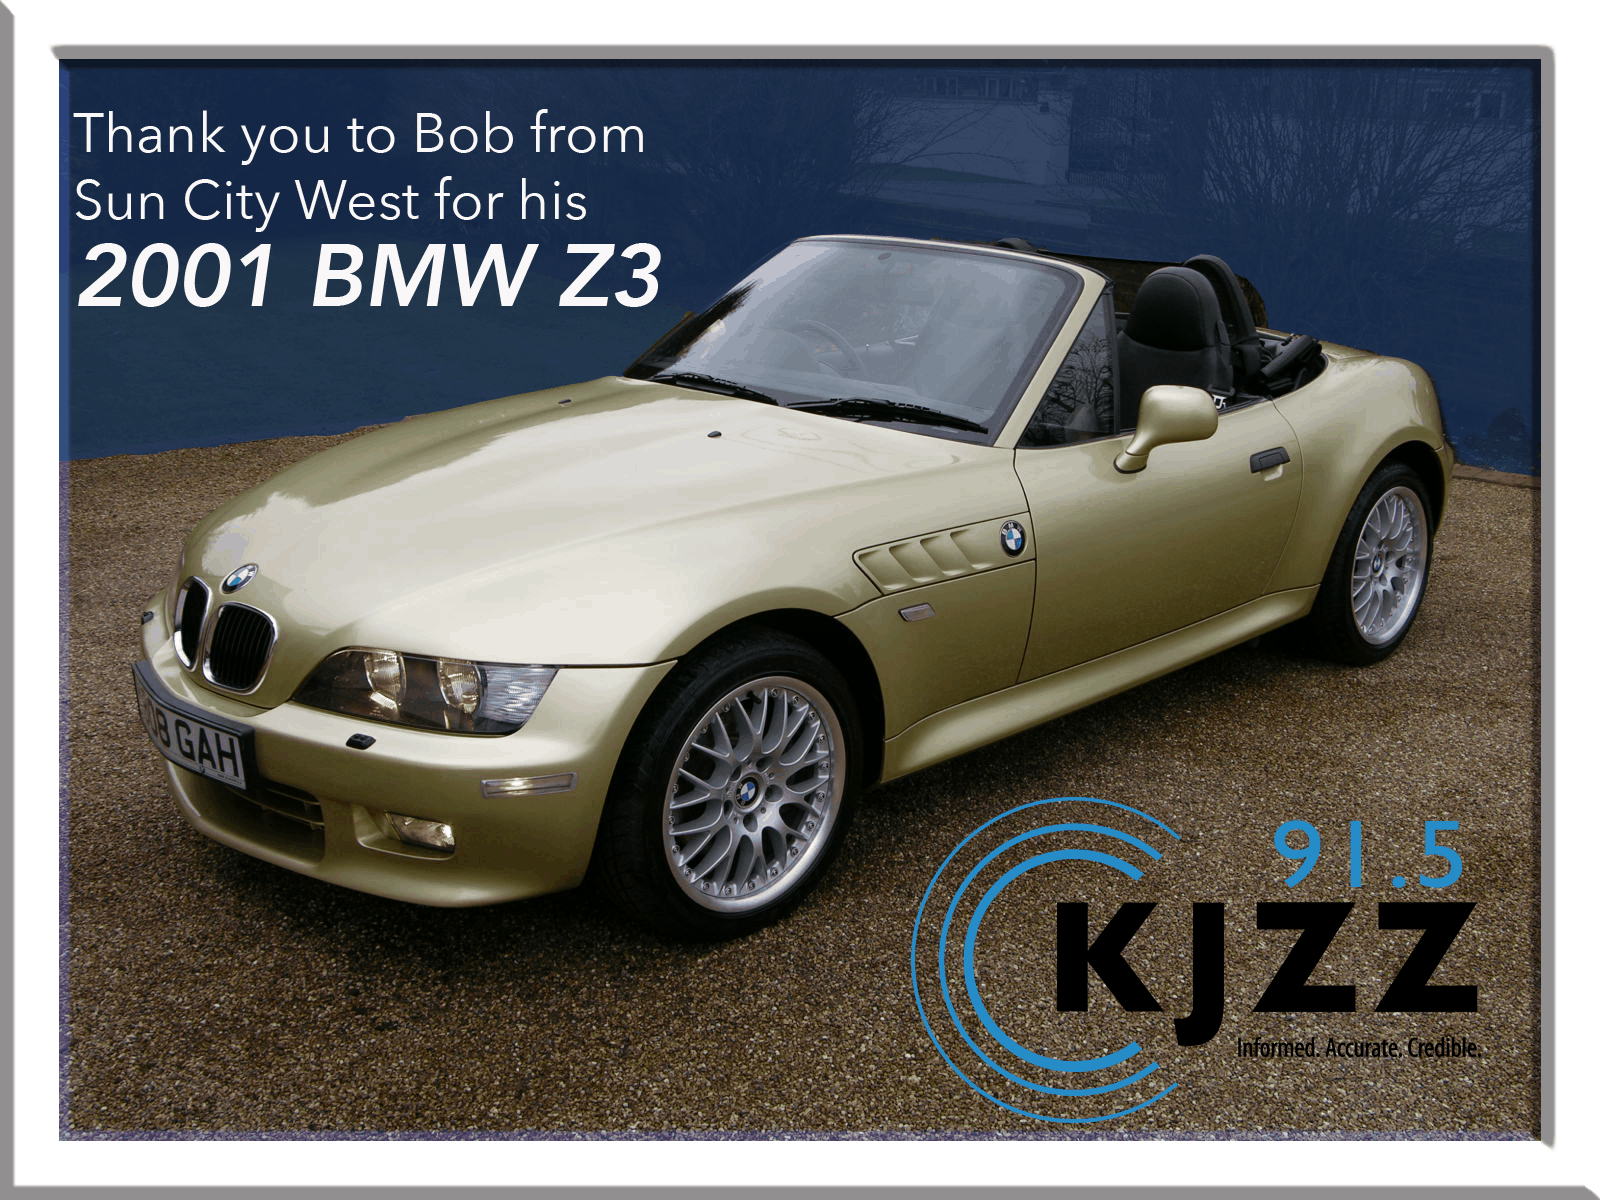 Car Donation KJZZ 1